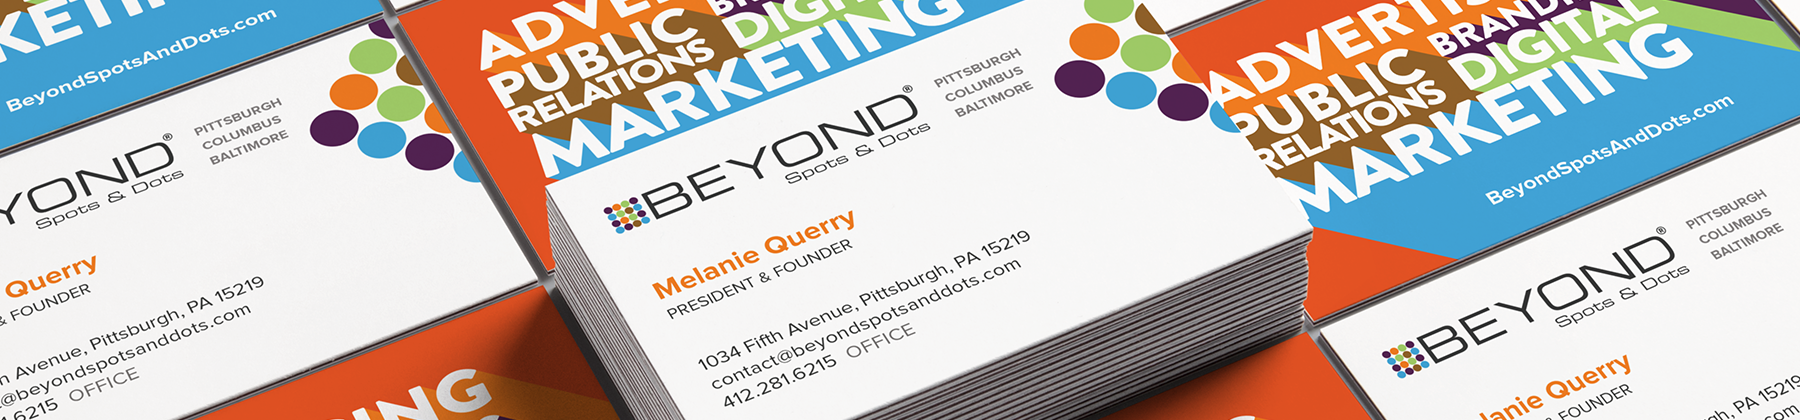 Beyond Spots & Dots Corporate Identity